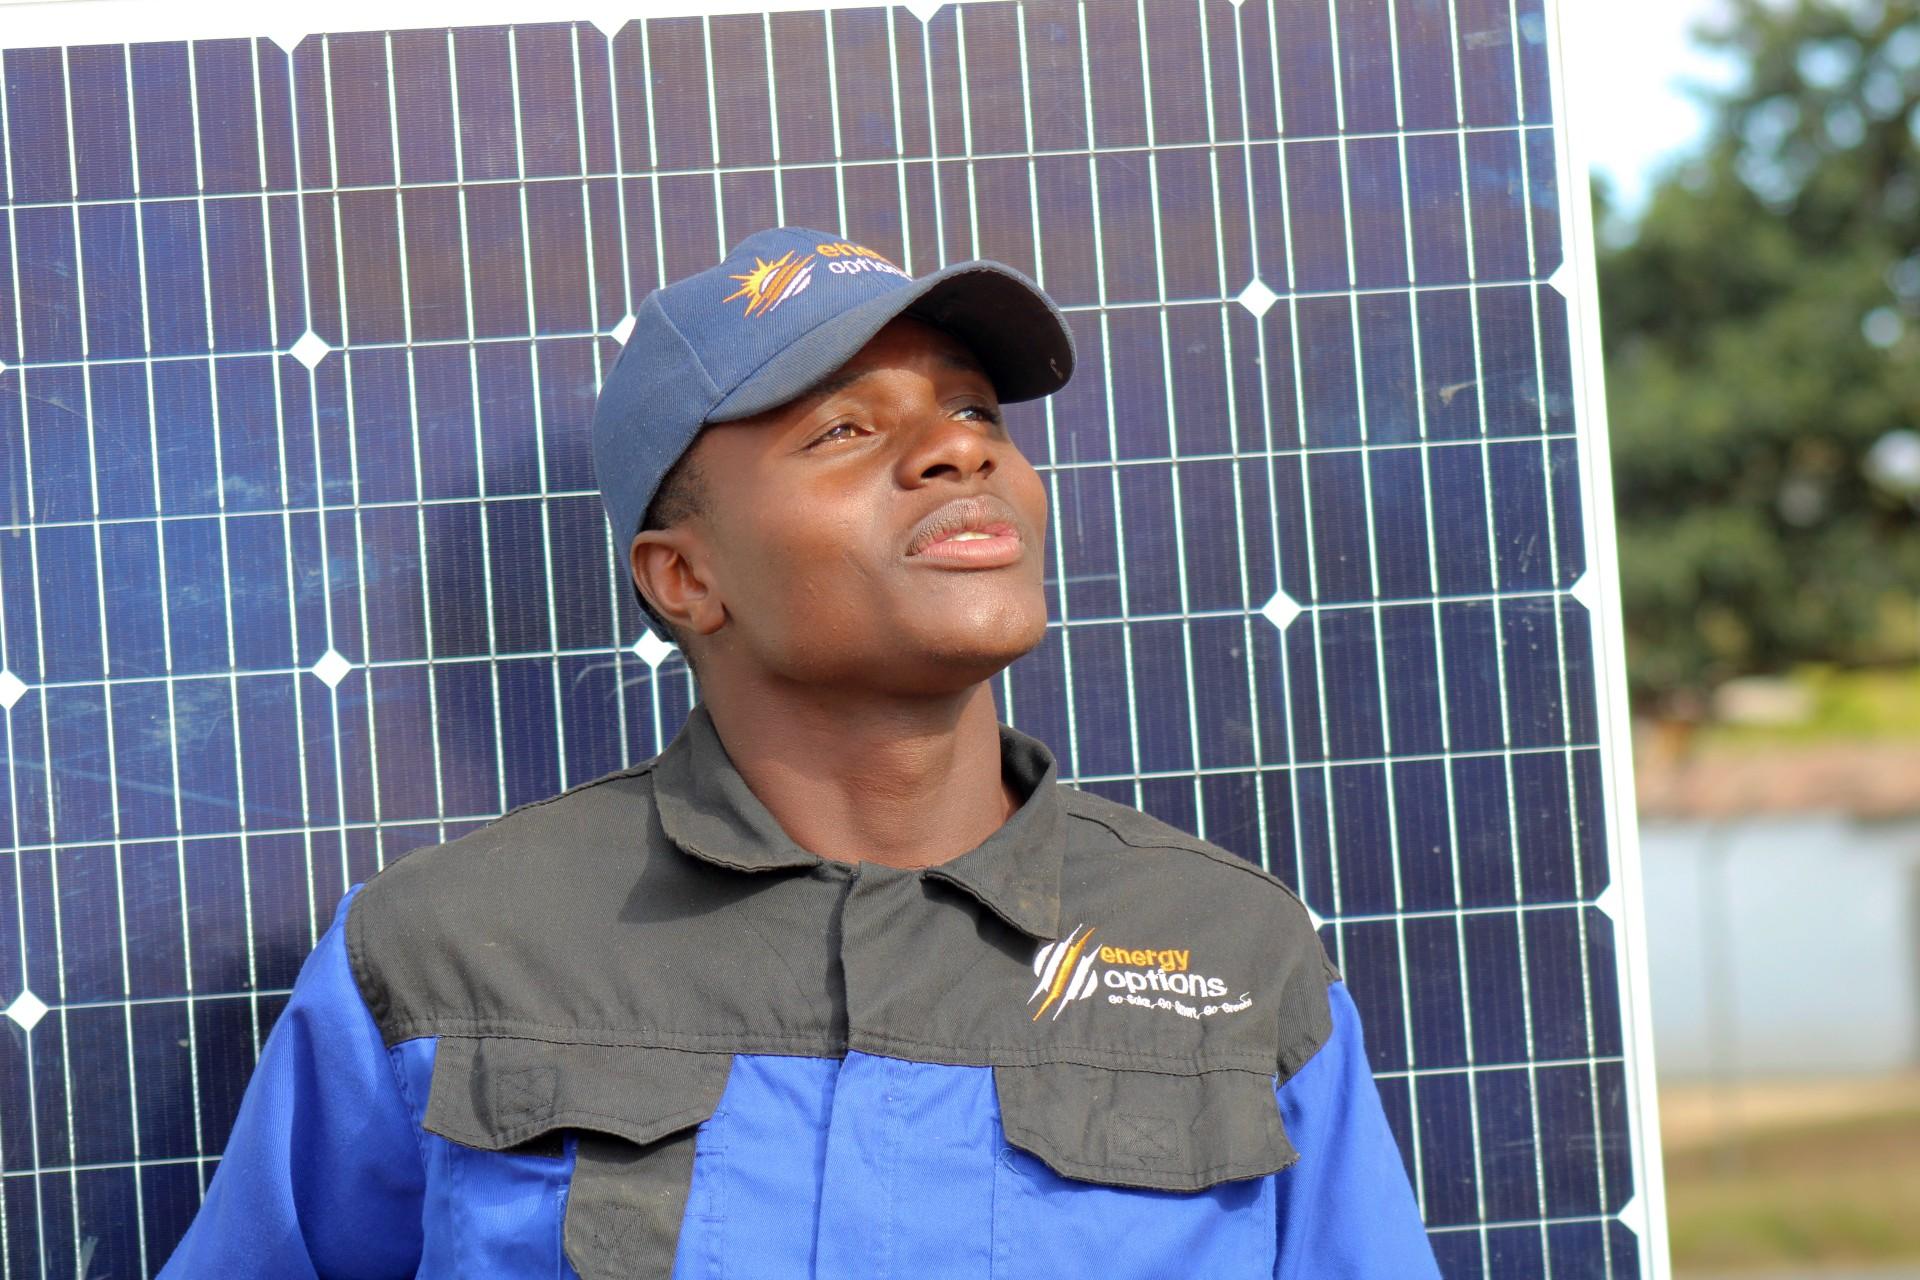 Check These Top 10 Solar Energy Myths